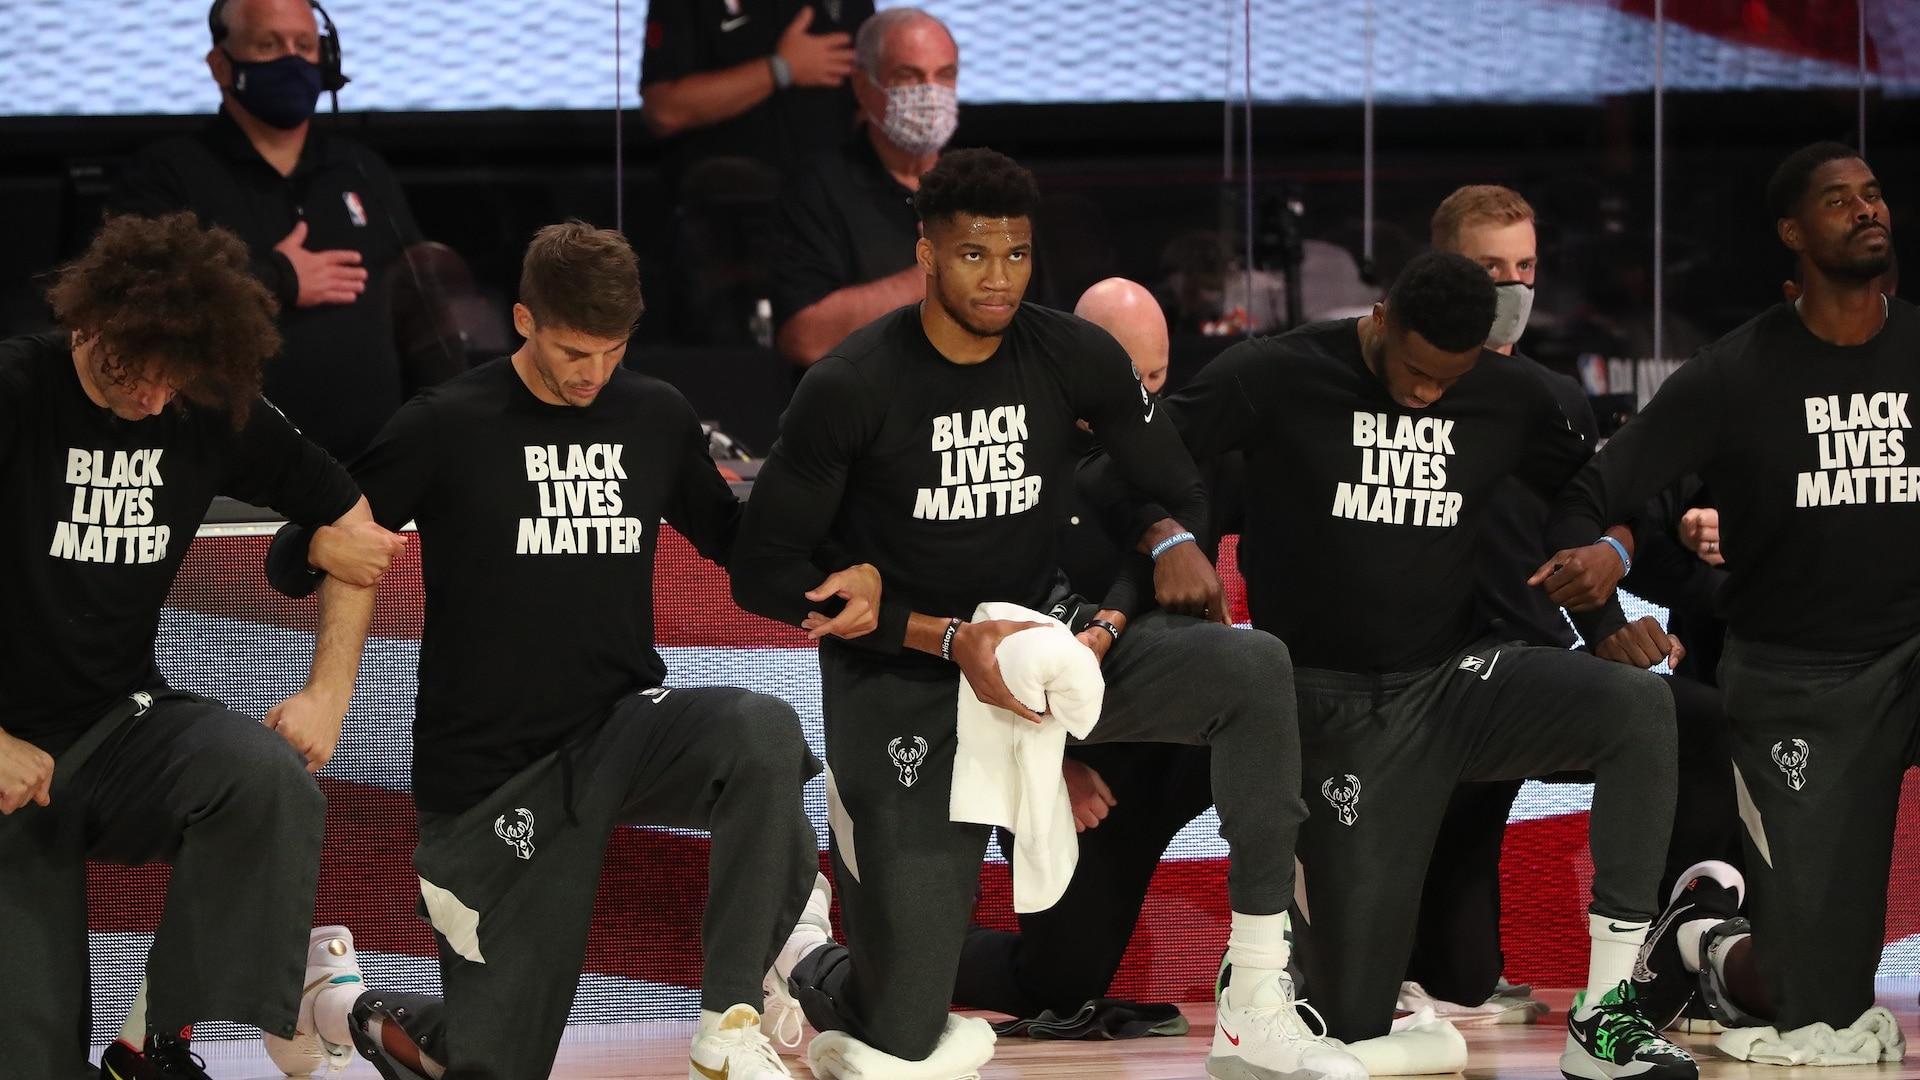 Jacob Blake's shooting by Kenosha police redoubles Bucks' focus on social justice